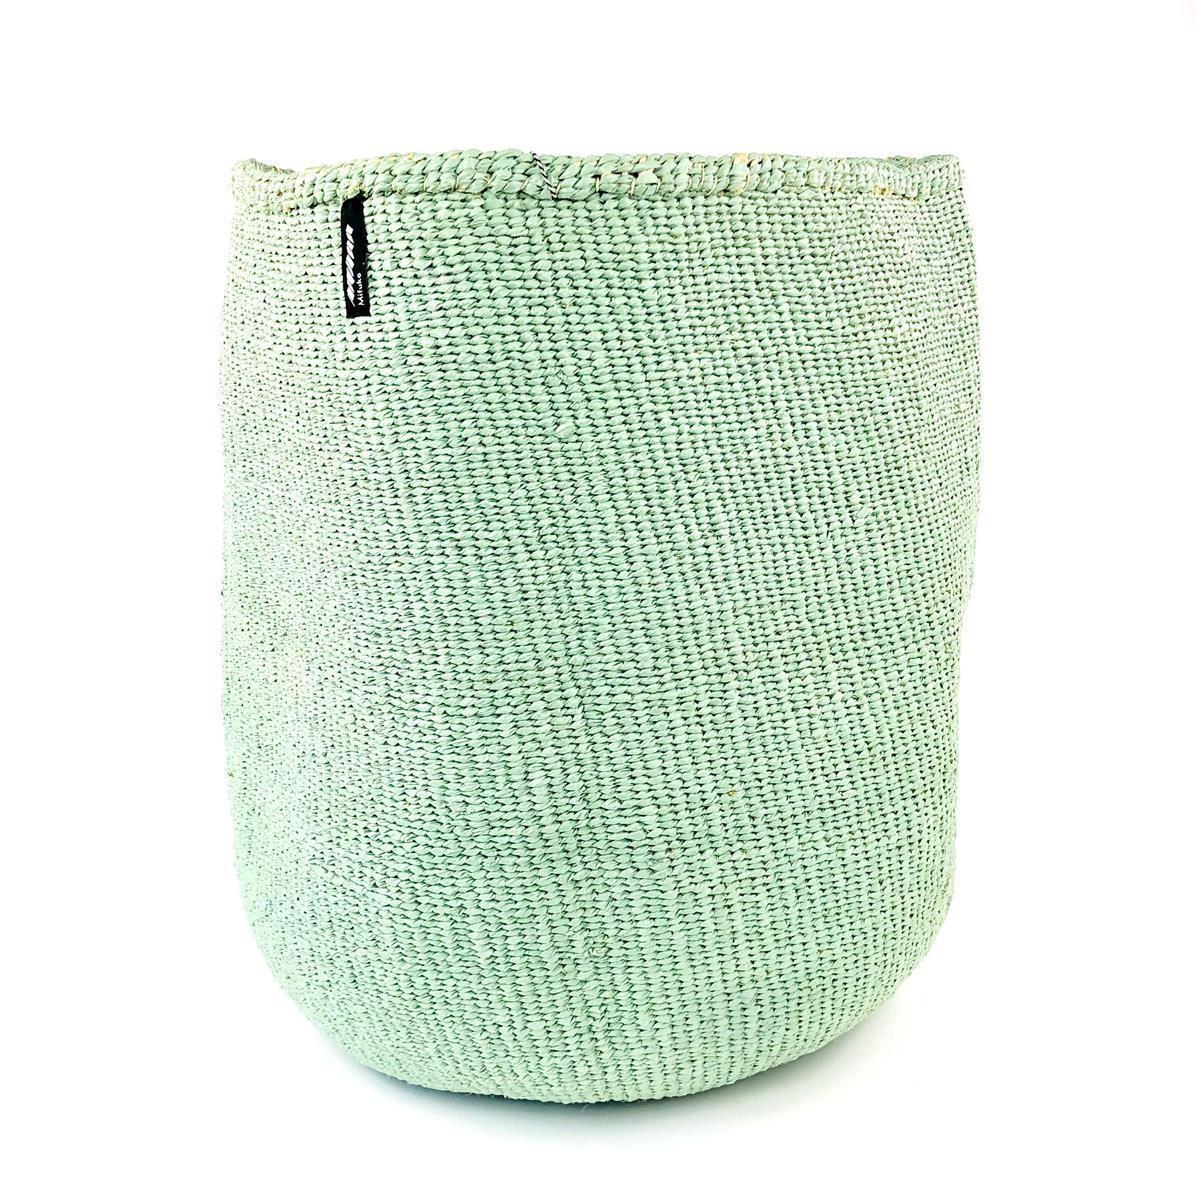 Bodenkorb KIONDO XL Salbeigrün